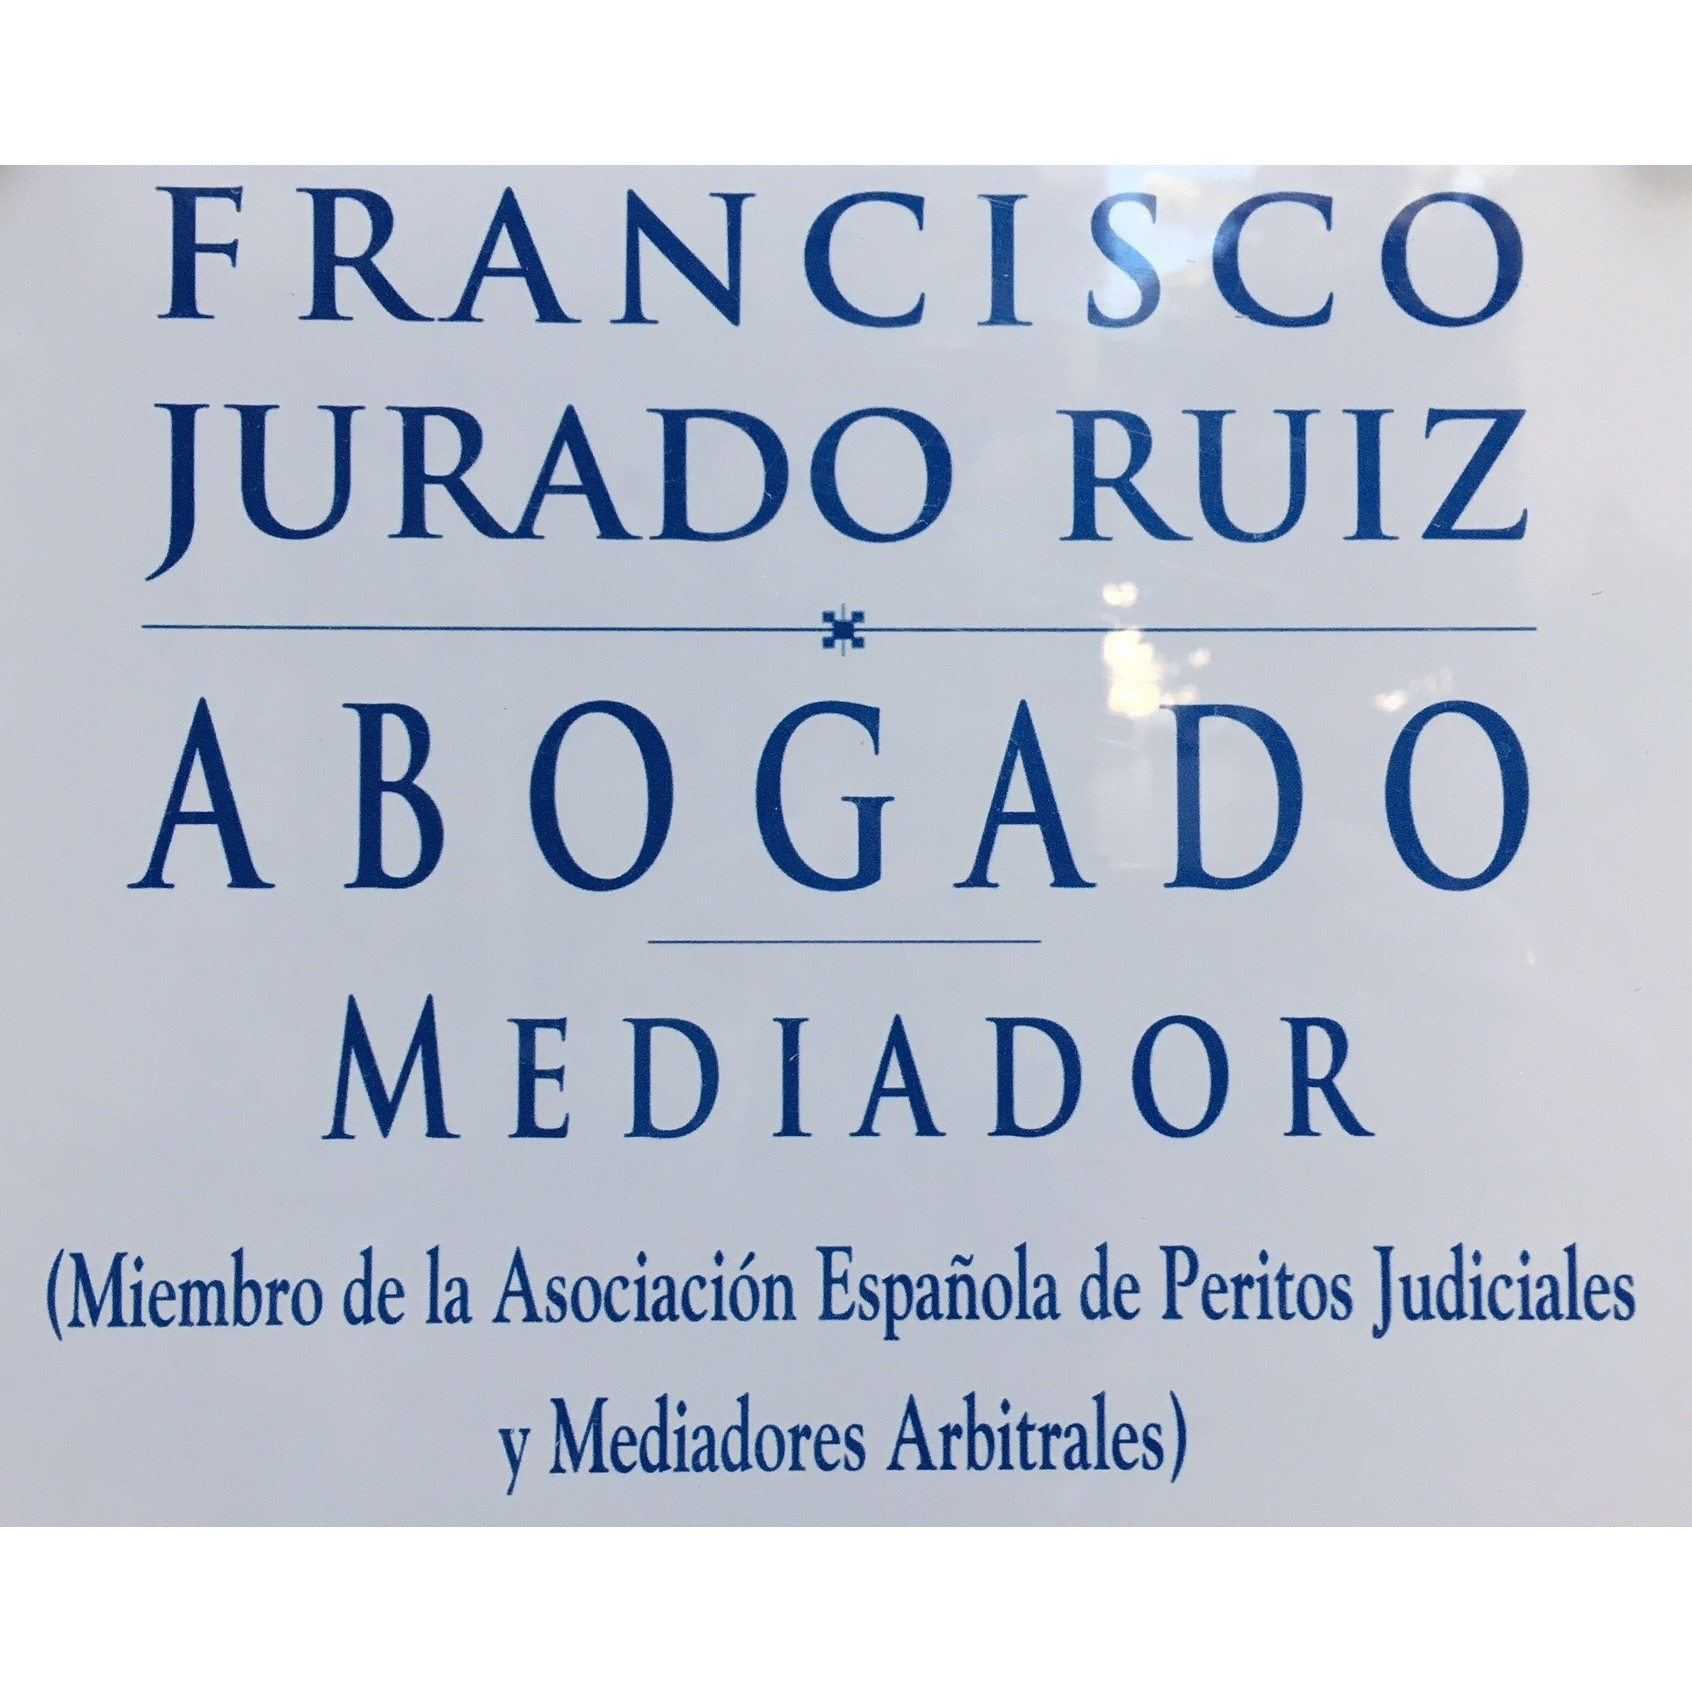 Abogado Francisco Jurado Ruiz